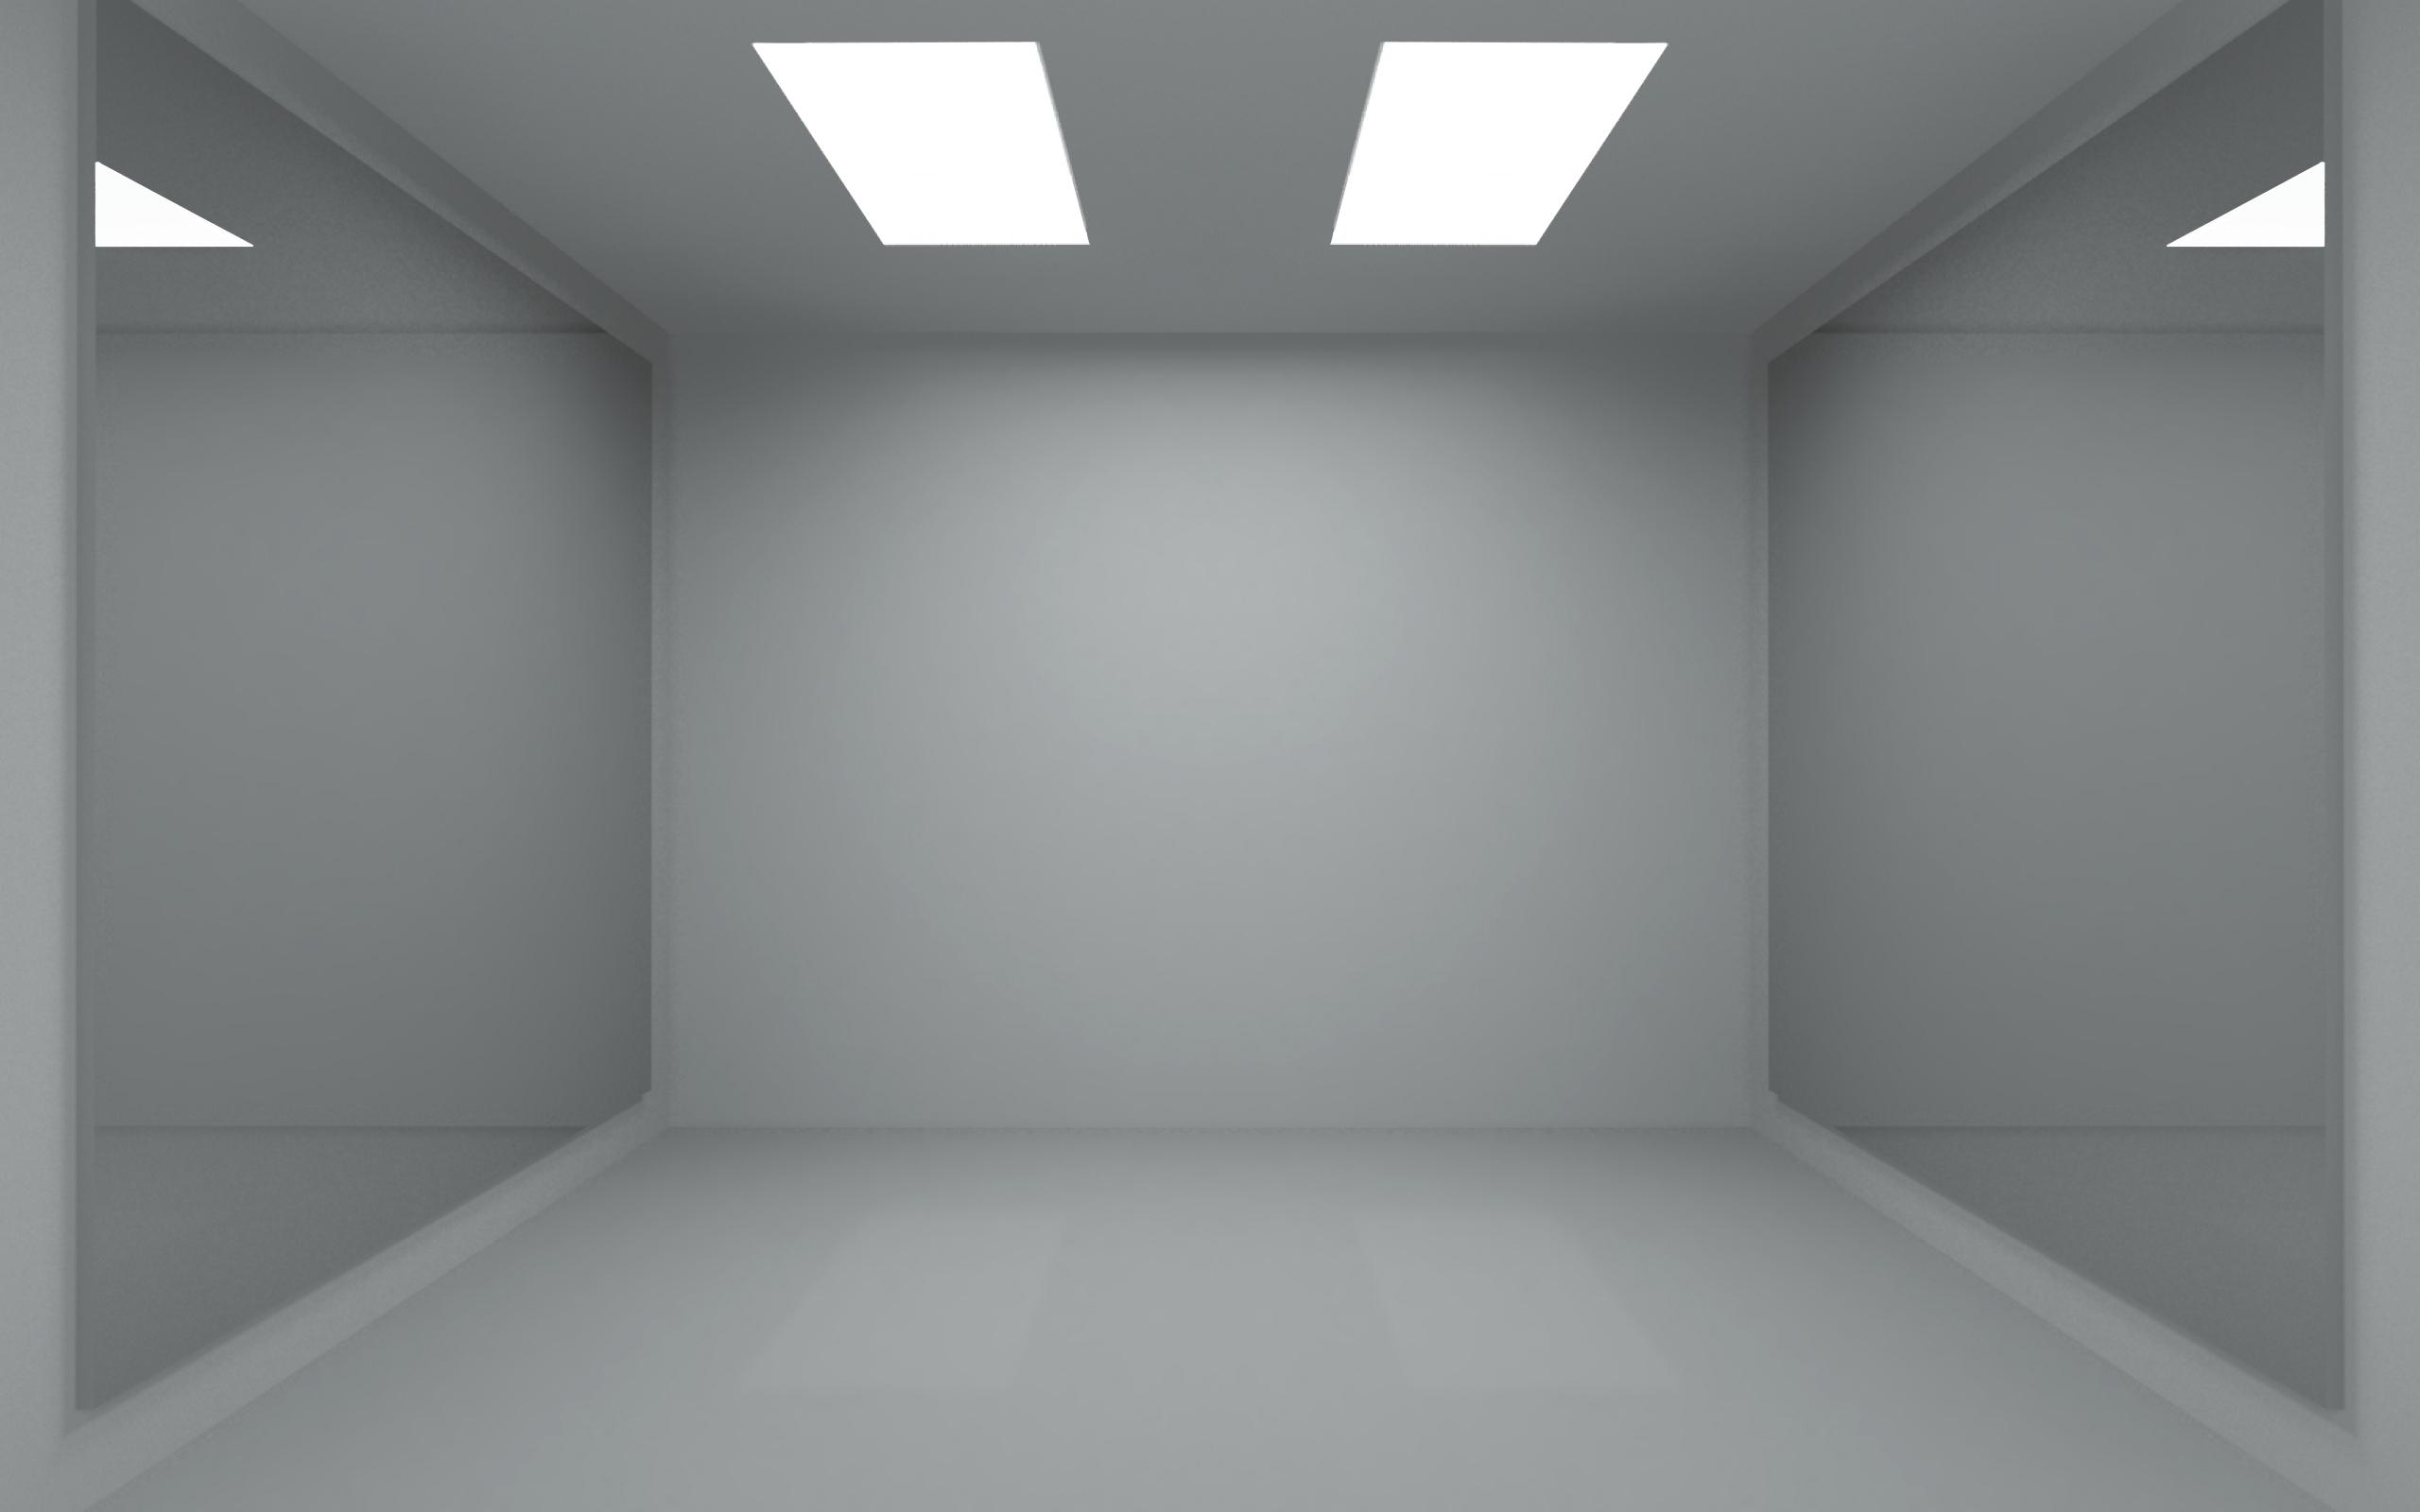 Minimalistic Grey Mirror Room by KAYOver Minimalistic Grey Mirror Room by  KAYOver. Minimalistic Grey Mirror Room by KAYOver on DeviantArt